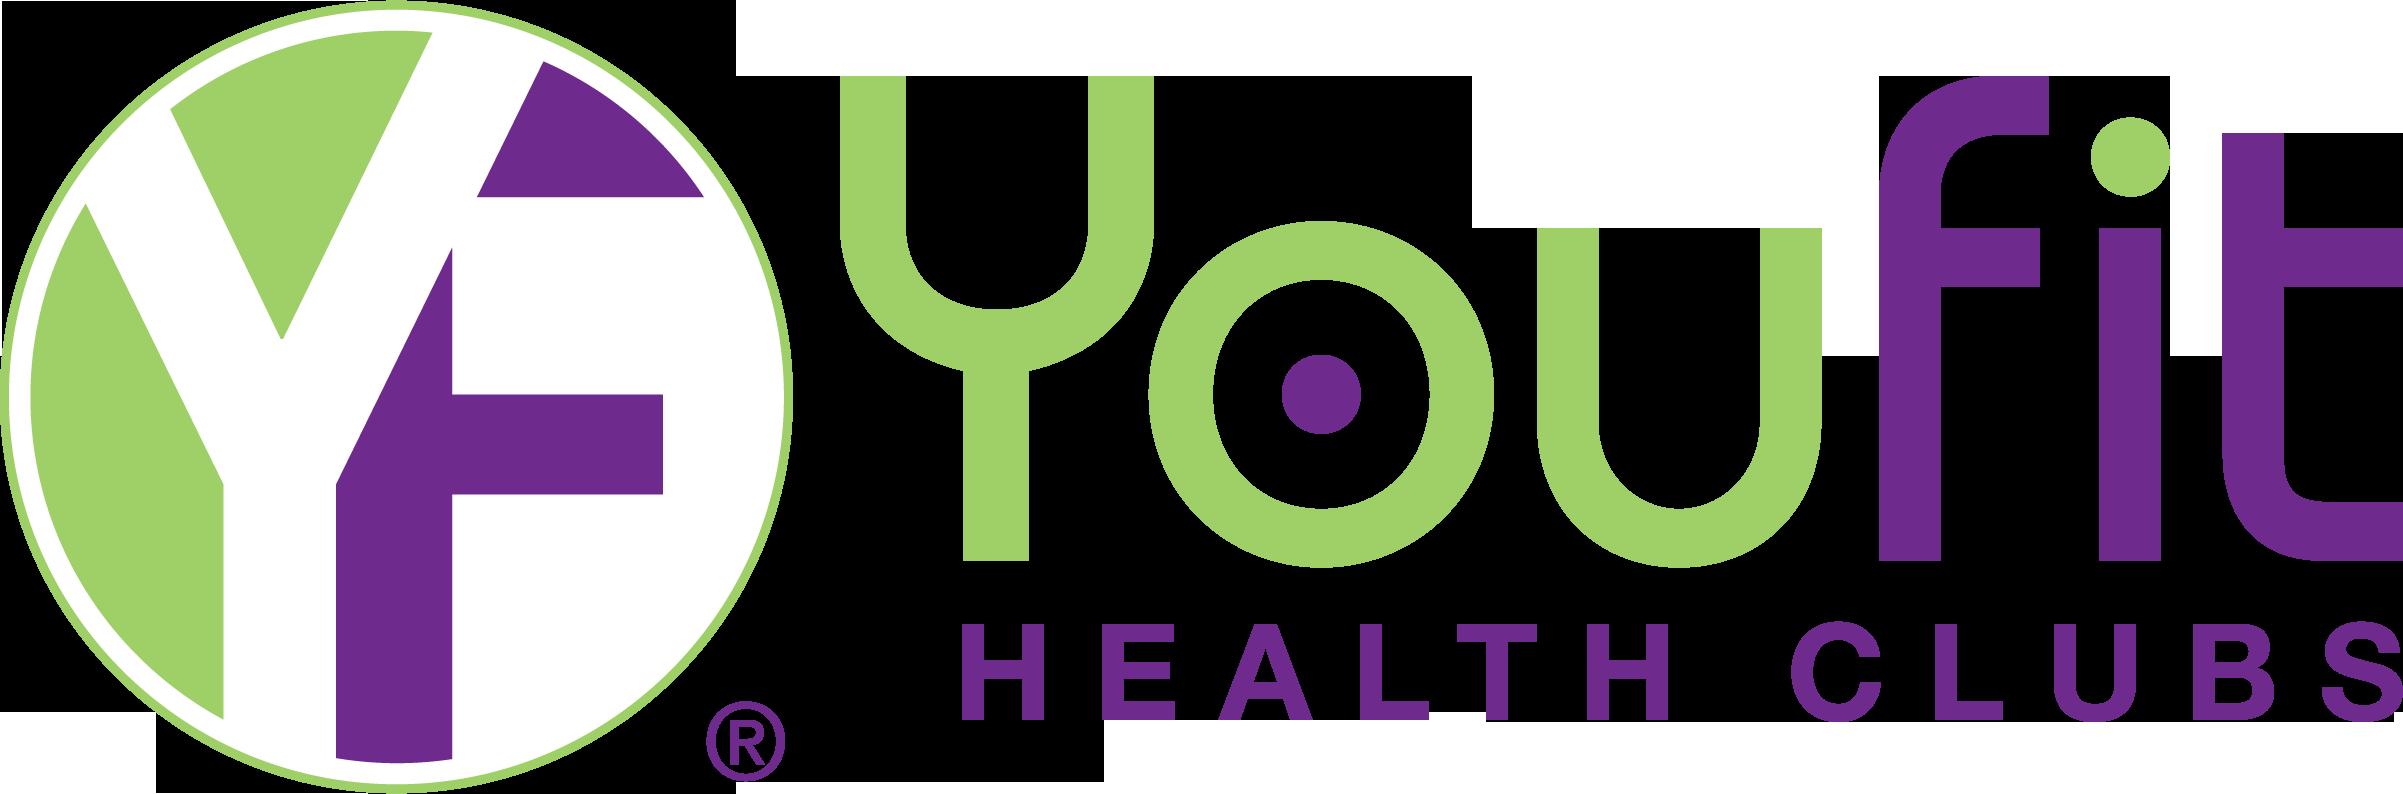 http://phginc.net/wp-content/uploads/2016/12/YF-Horizontal-Logo-PNG.png